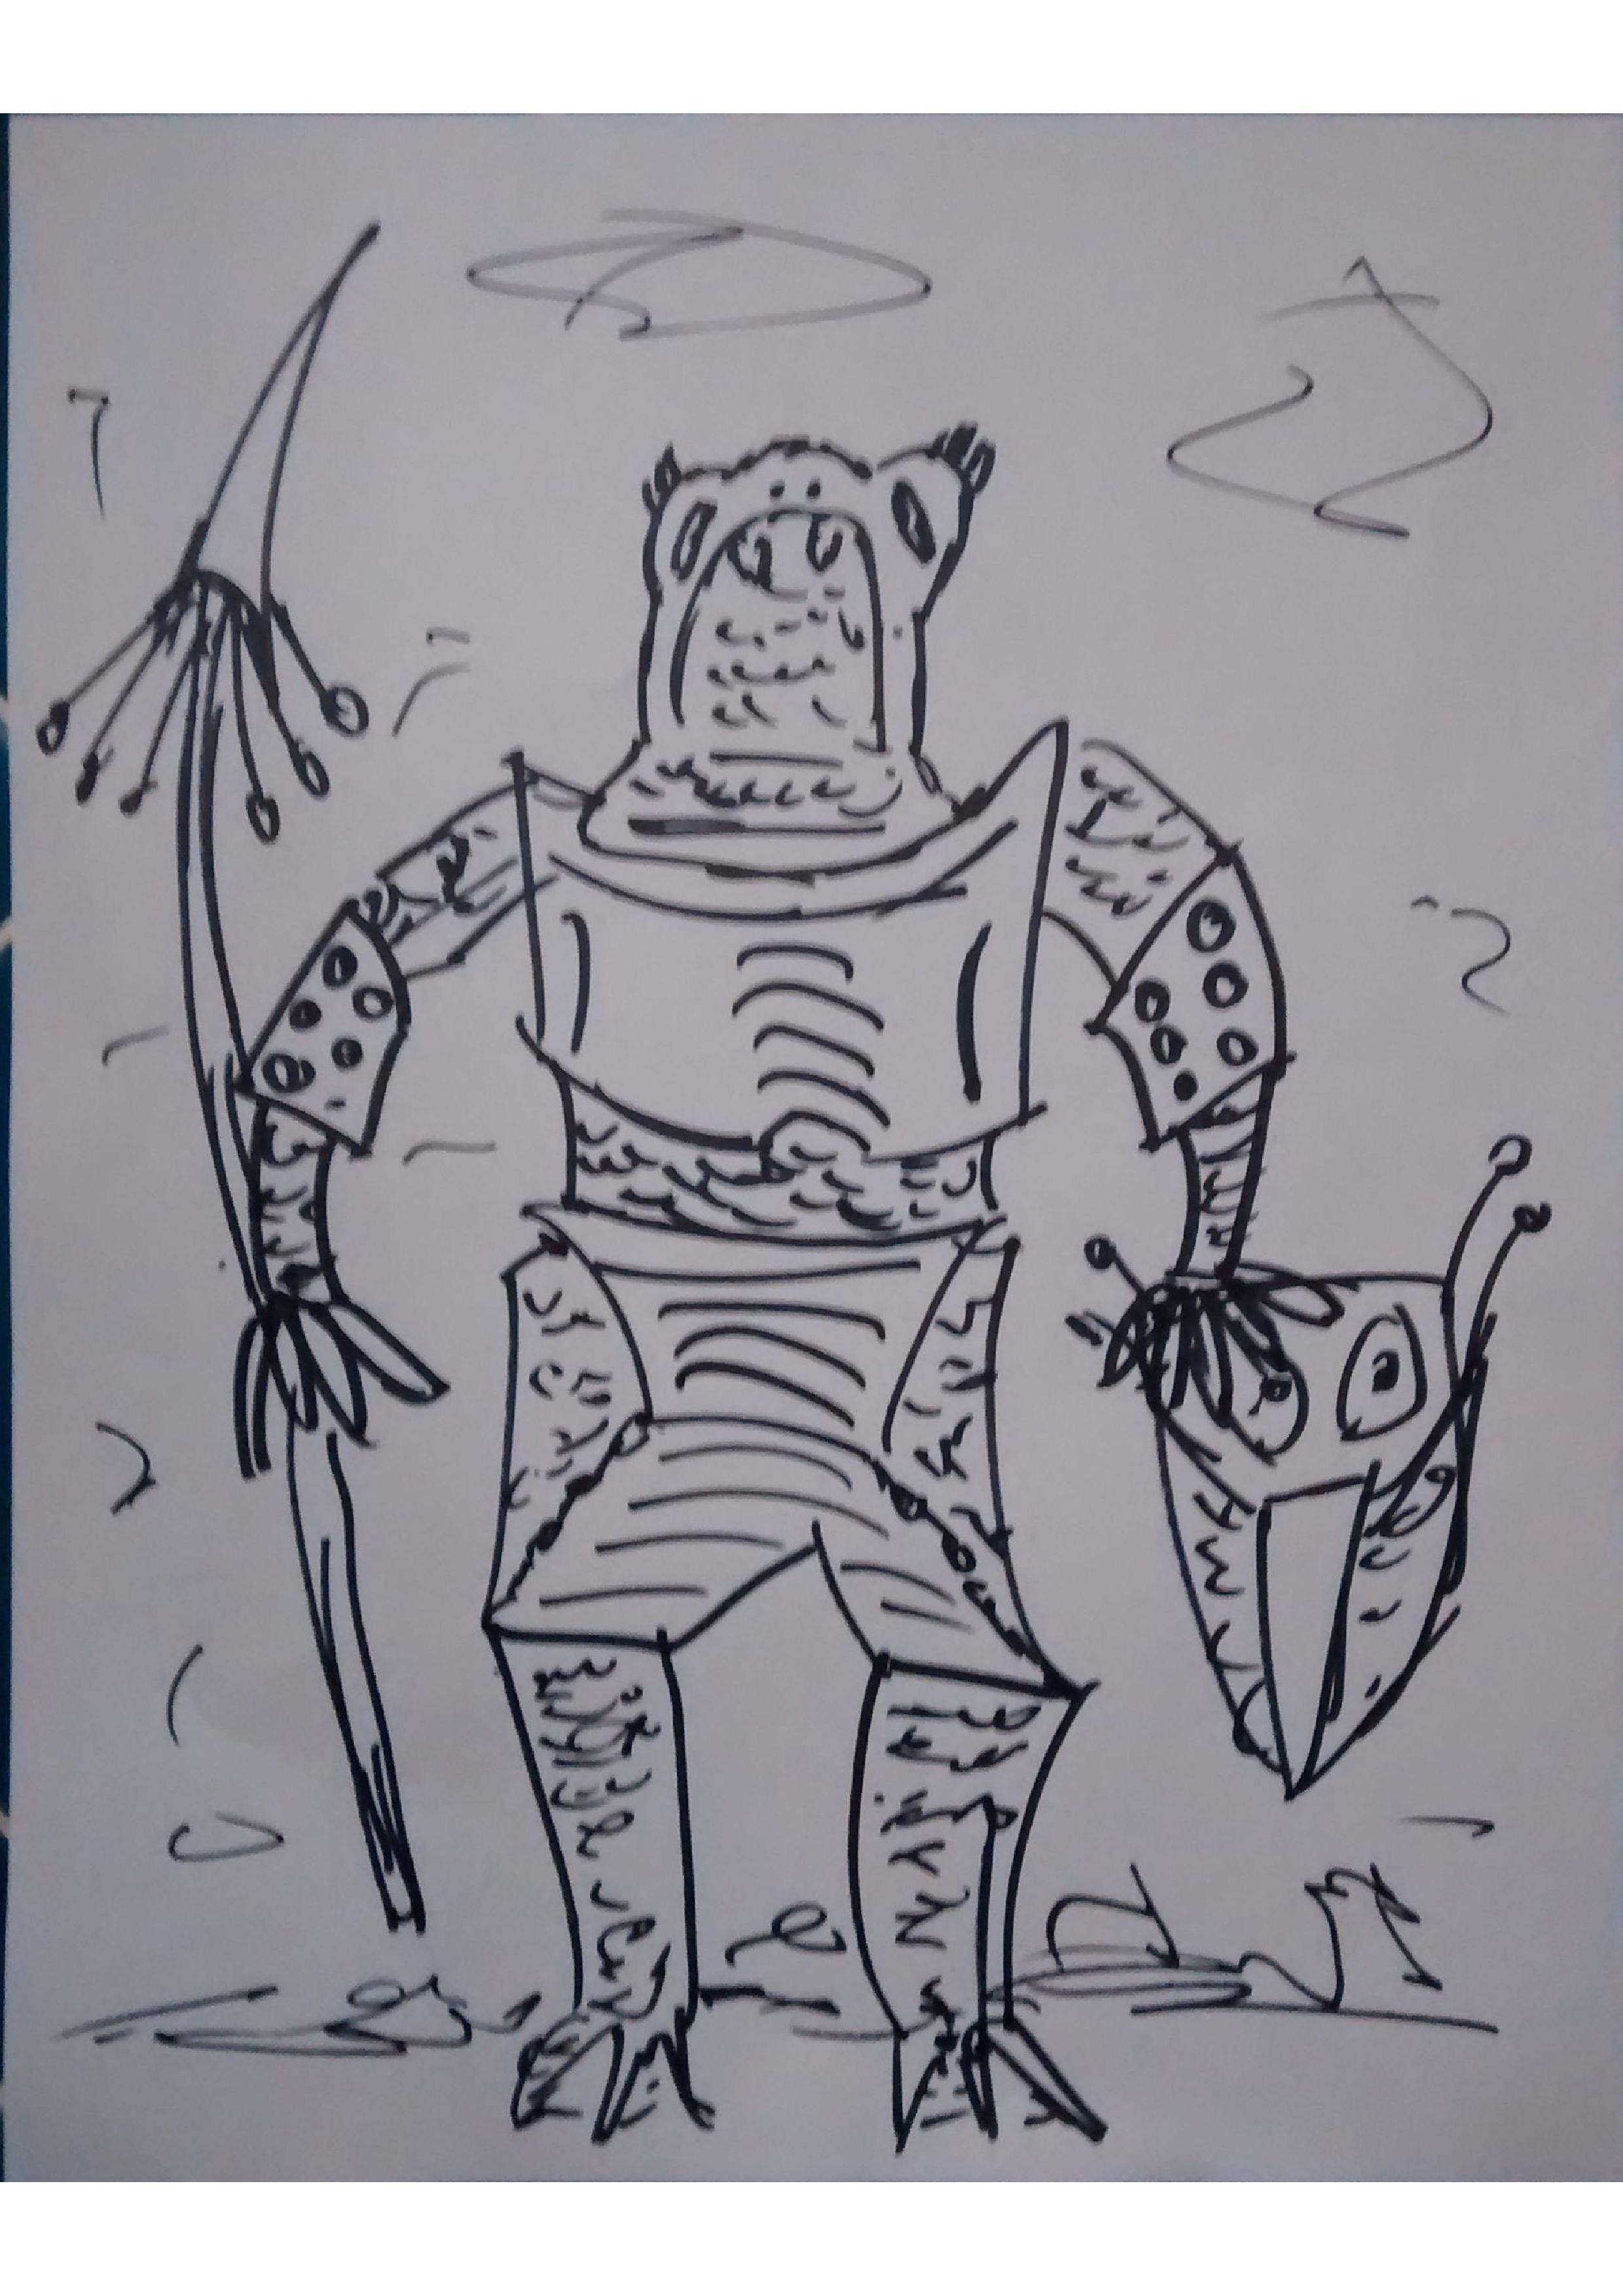 Frogger by KosmikWarrior